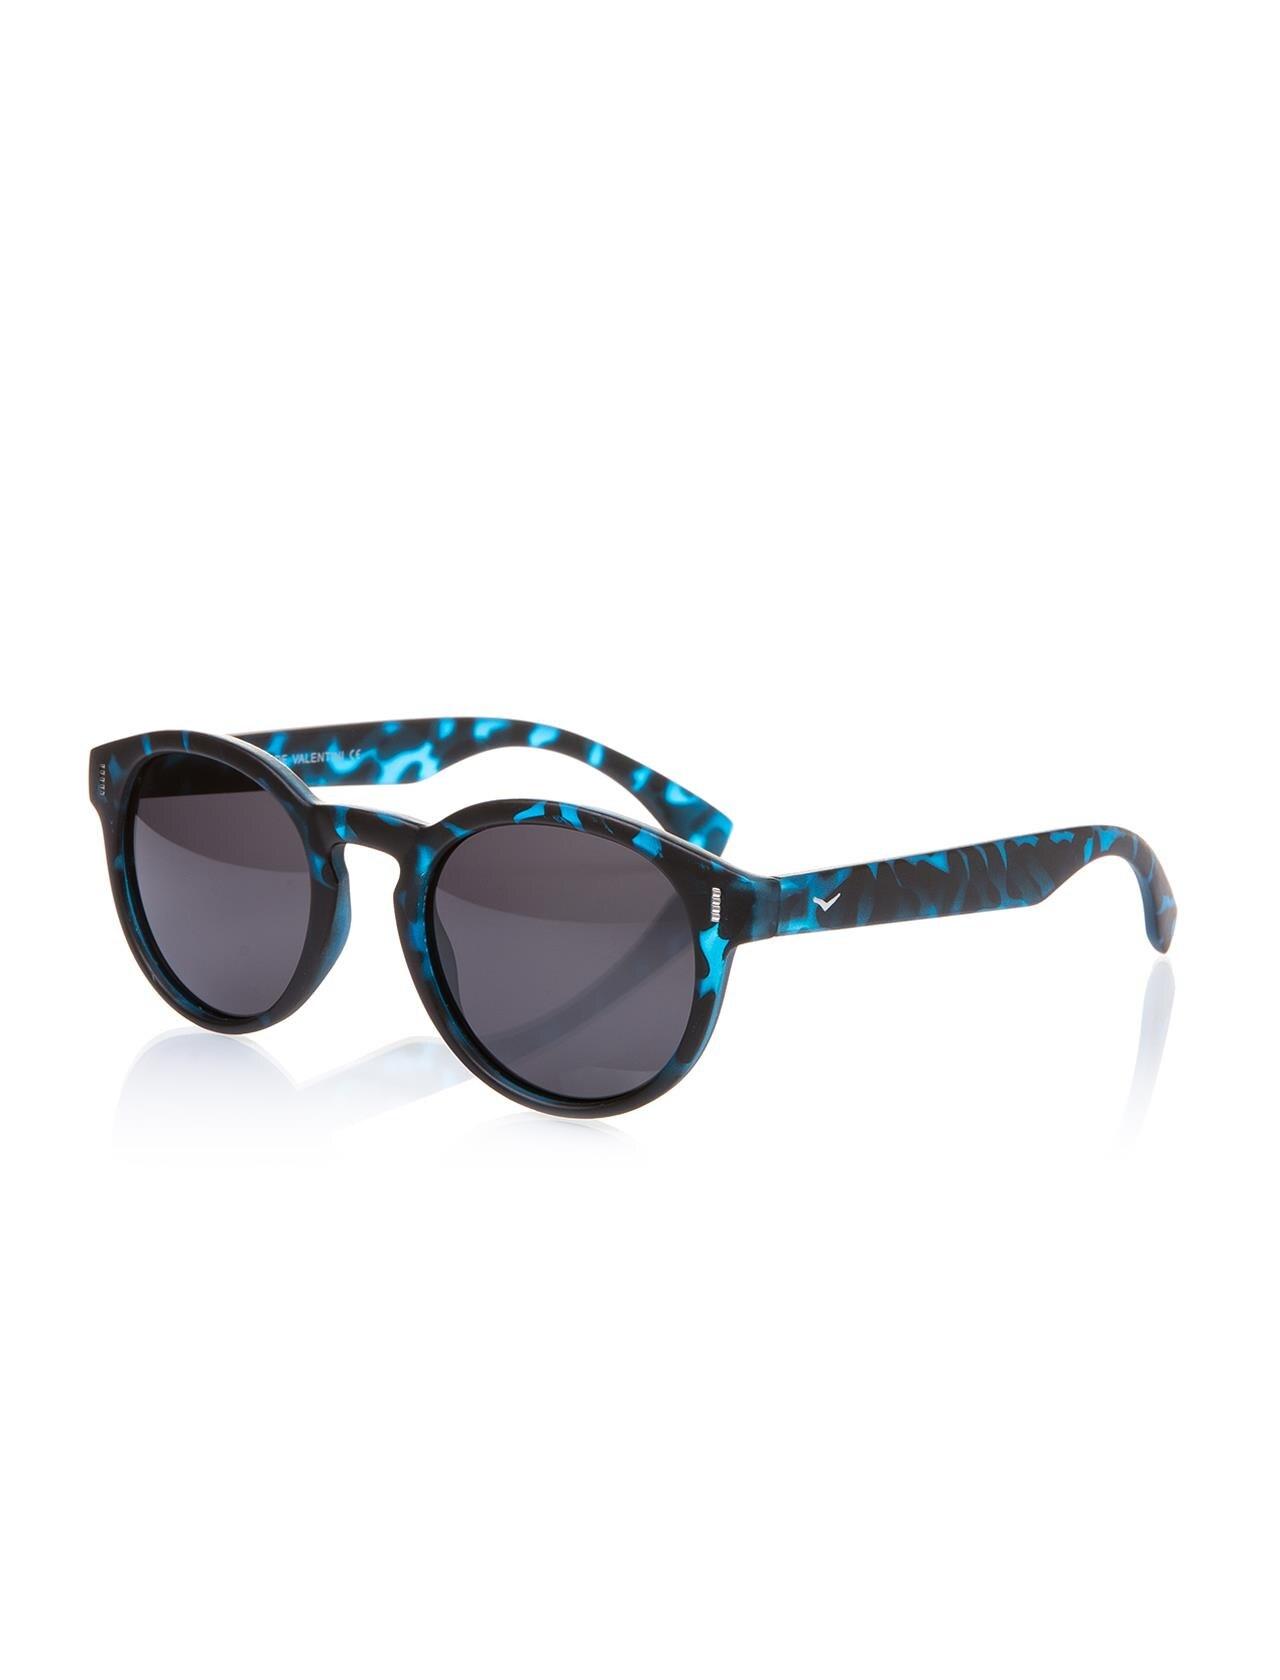 Unisex sunglasses dv 9019 04 bone Navy unspecified 47 -- de valentini